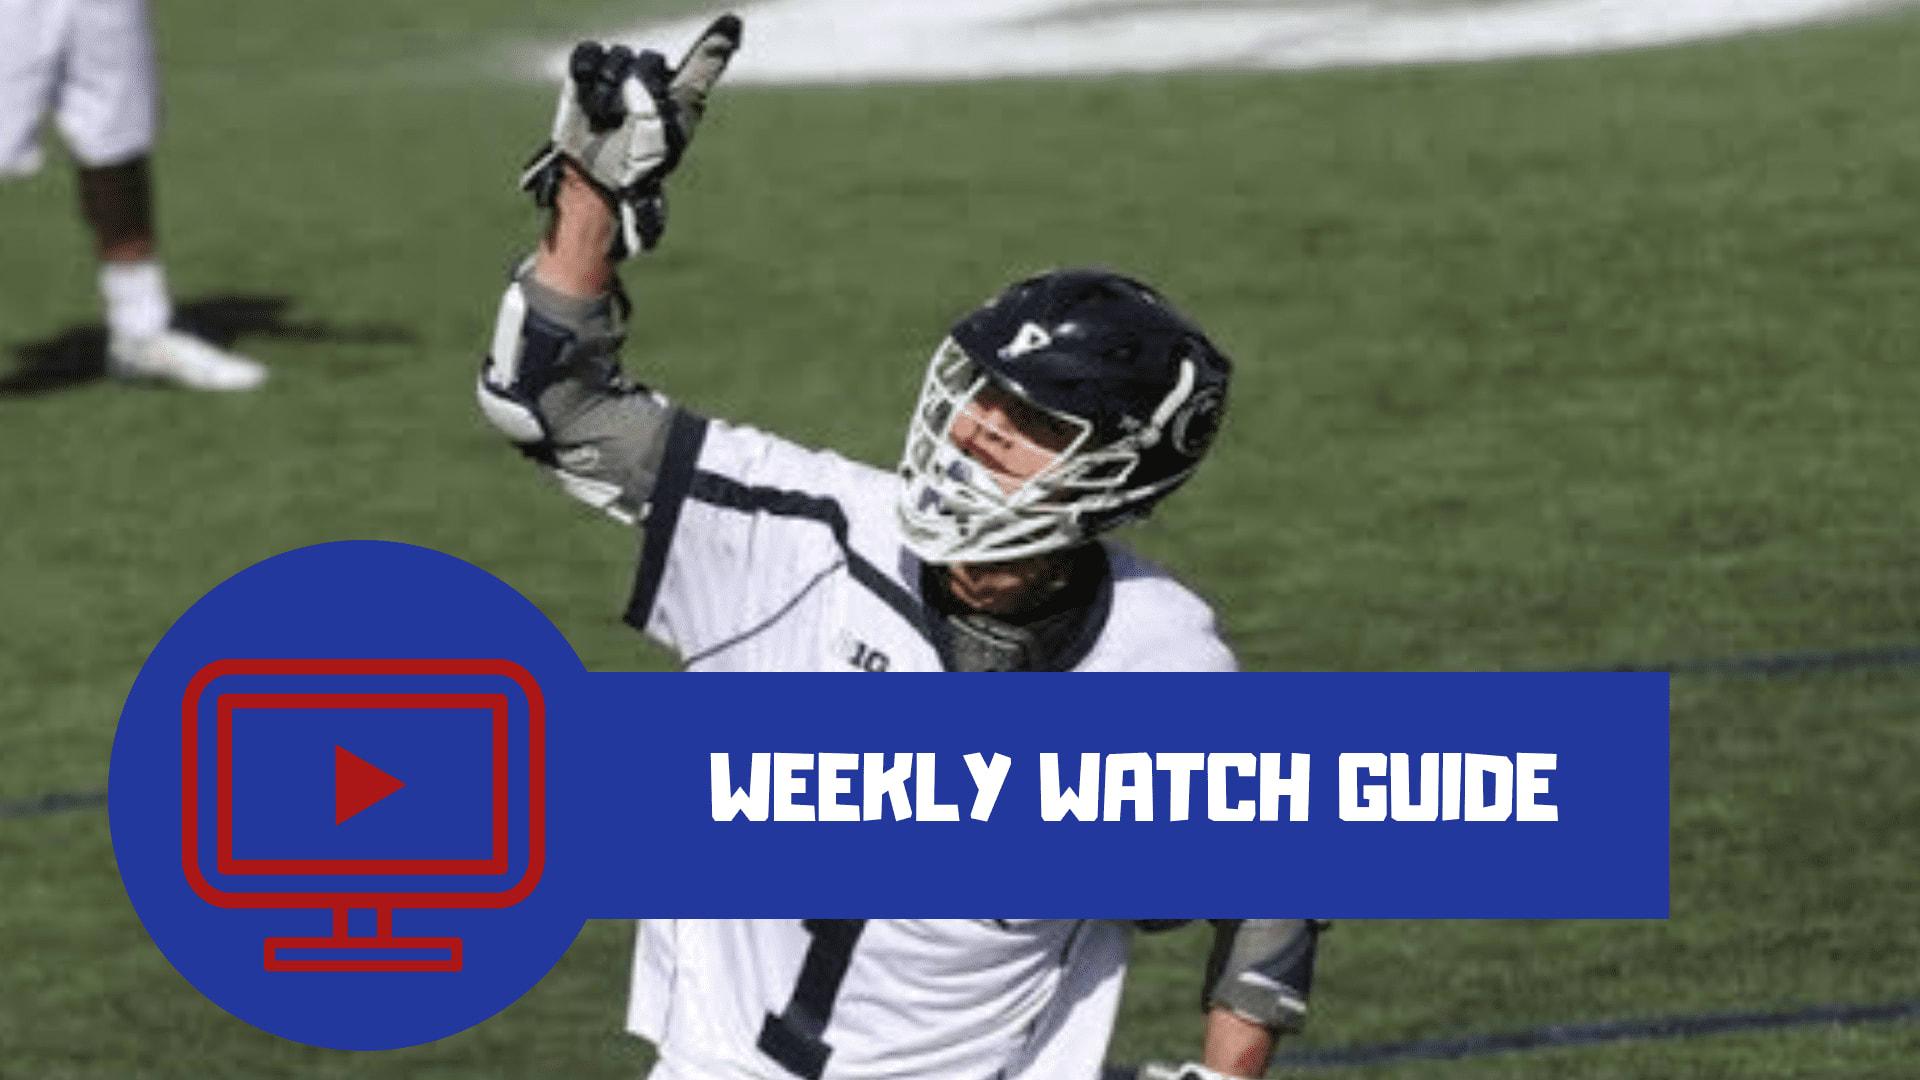 weekly watch guide tv